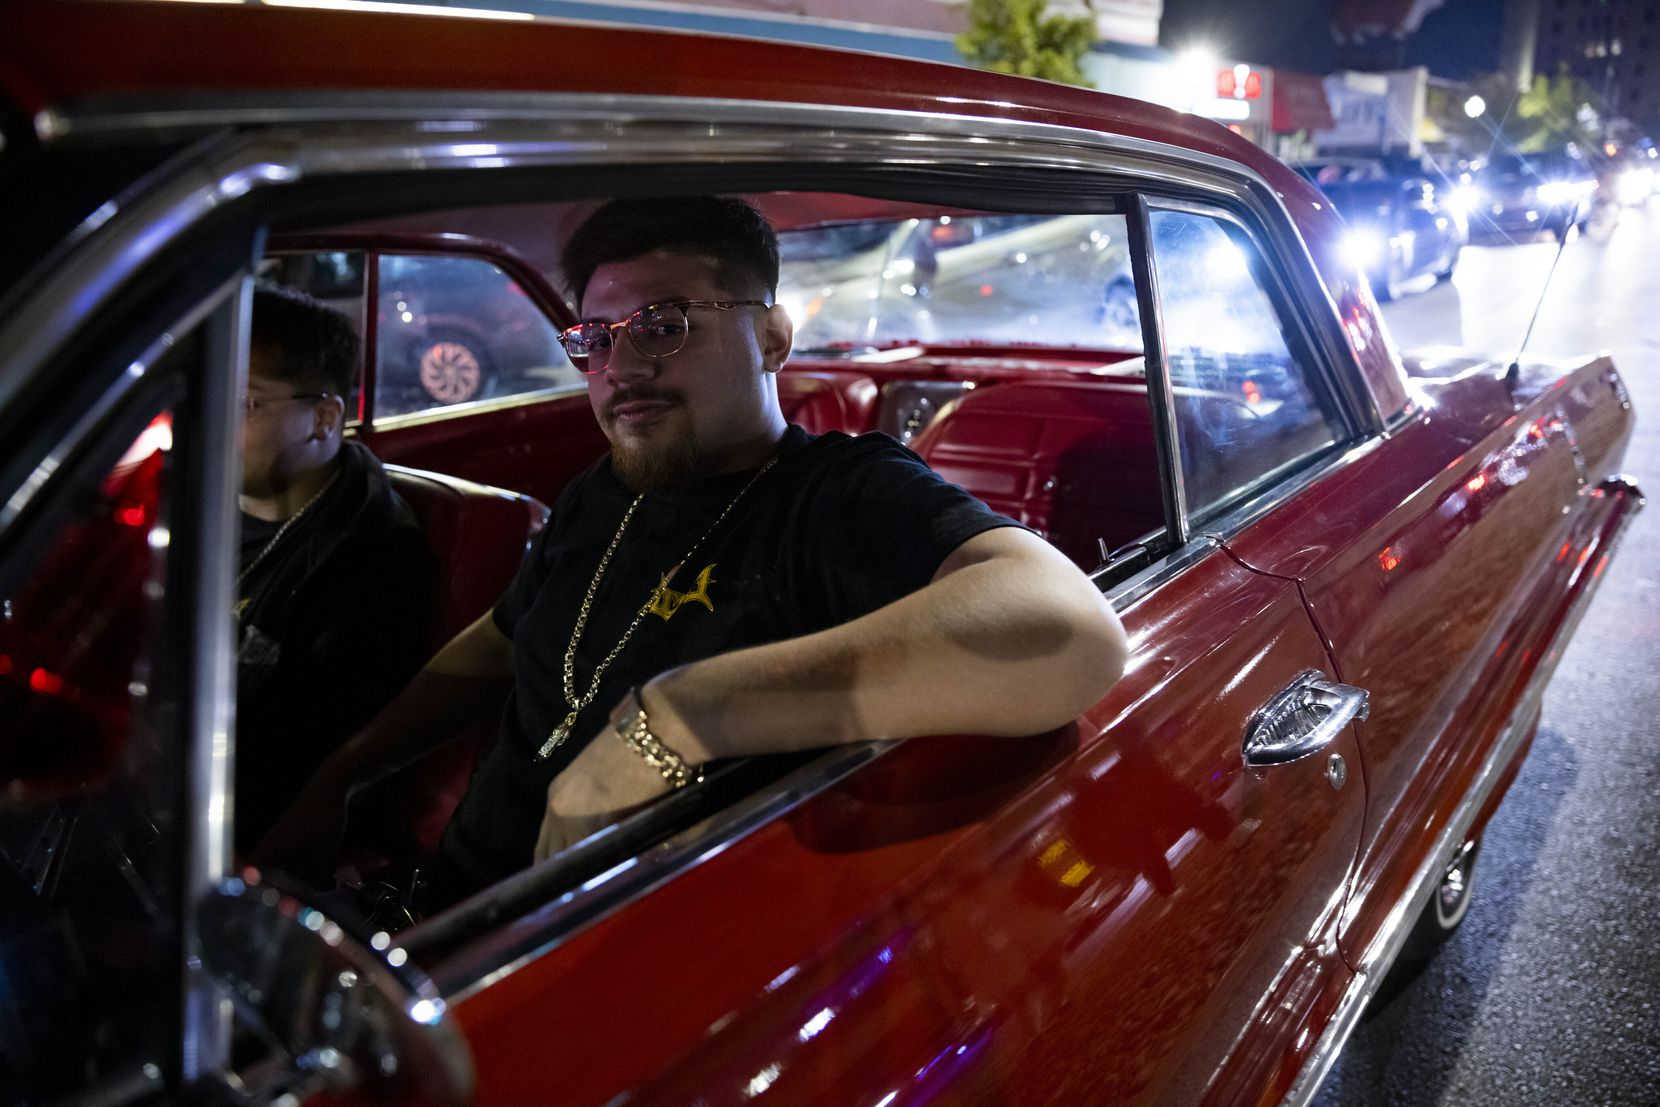 Juan Ortiz cruises in his 1963 Chevrolet Impala Super Sport on Sunday, Sept. 19, 2021, on Jefferson Boulevard in Dallas.